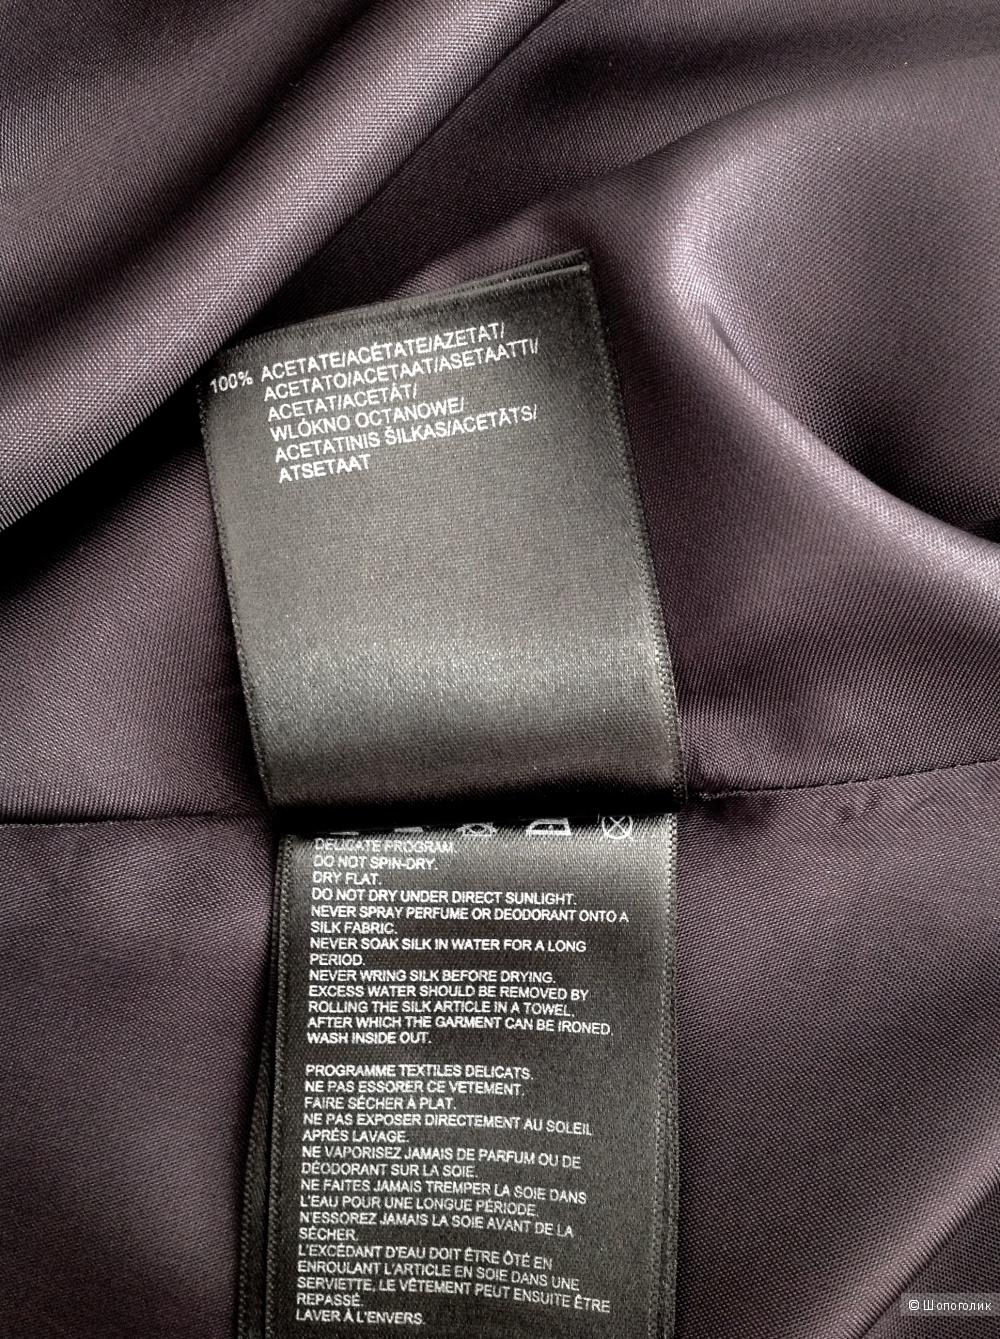 Шелковое платье Mexx, размер 44-46.